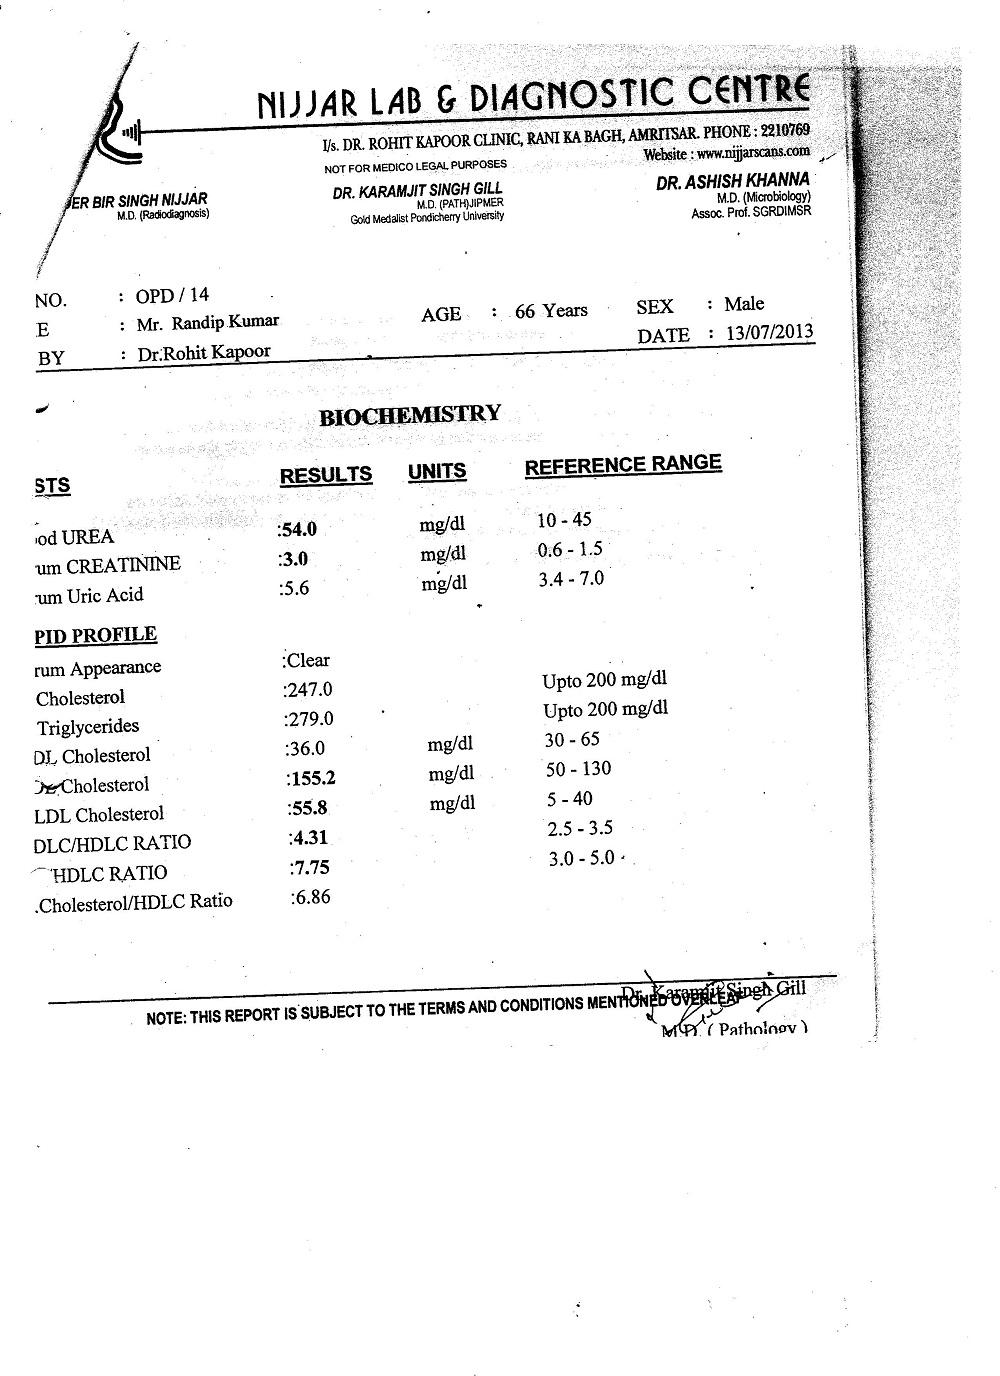 randeep-kumar-kaura-fatty-liver-kindey-failure-patient-treatment-15